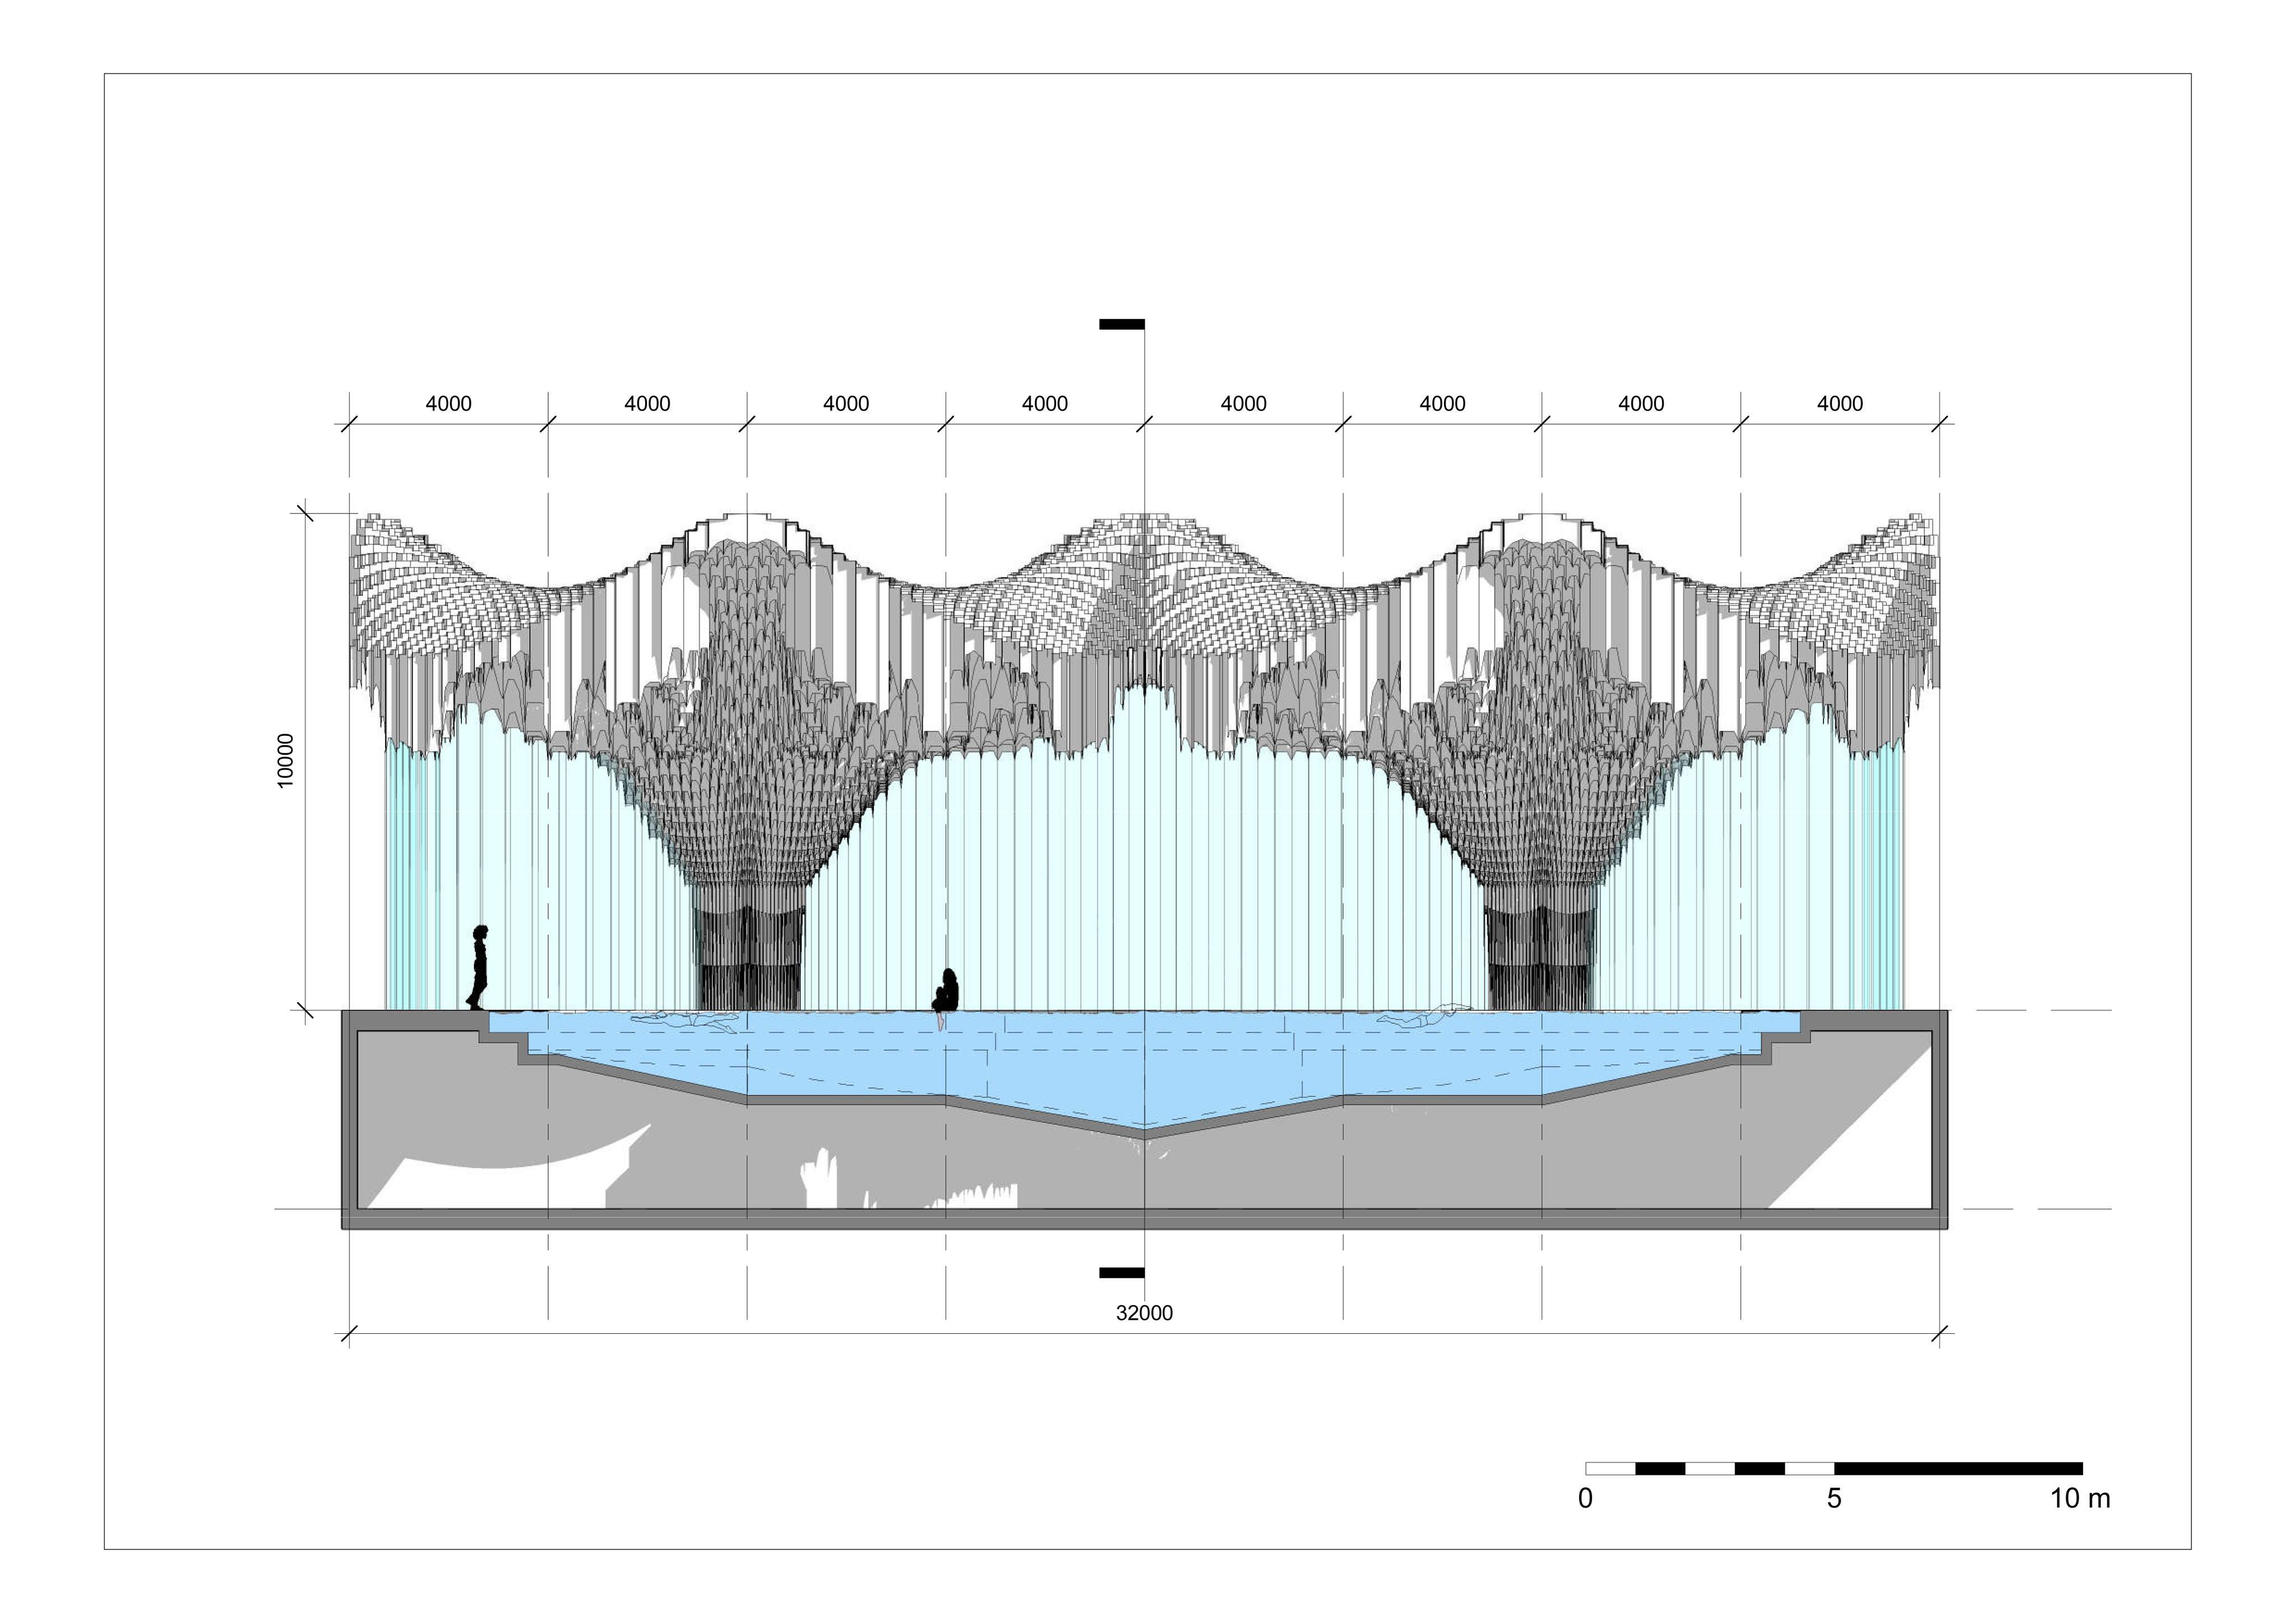 Muqarnas - Sheet - A203 - Pool - Section A